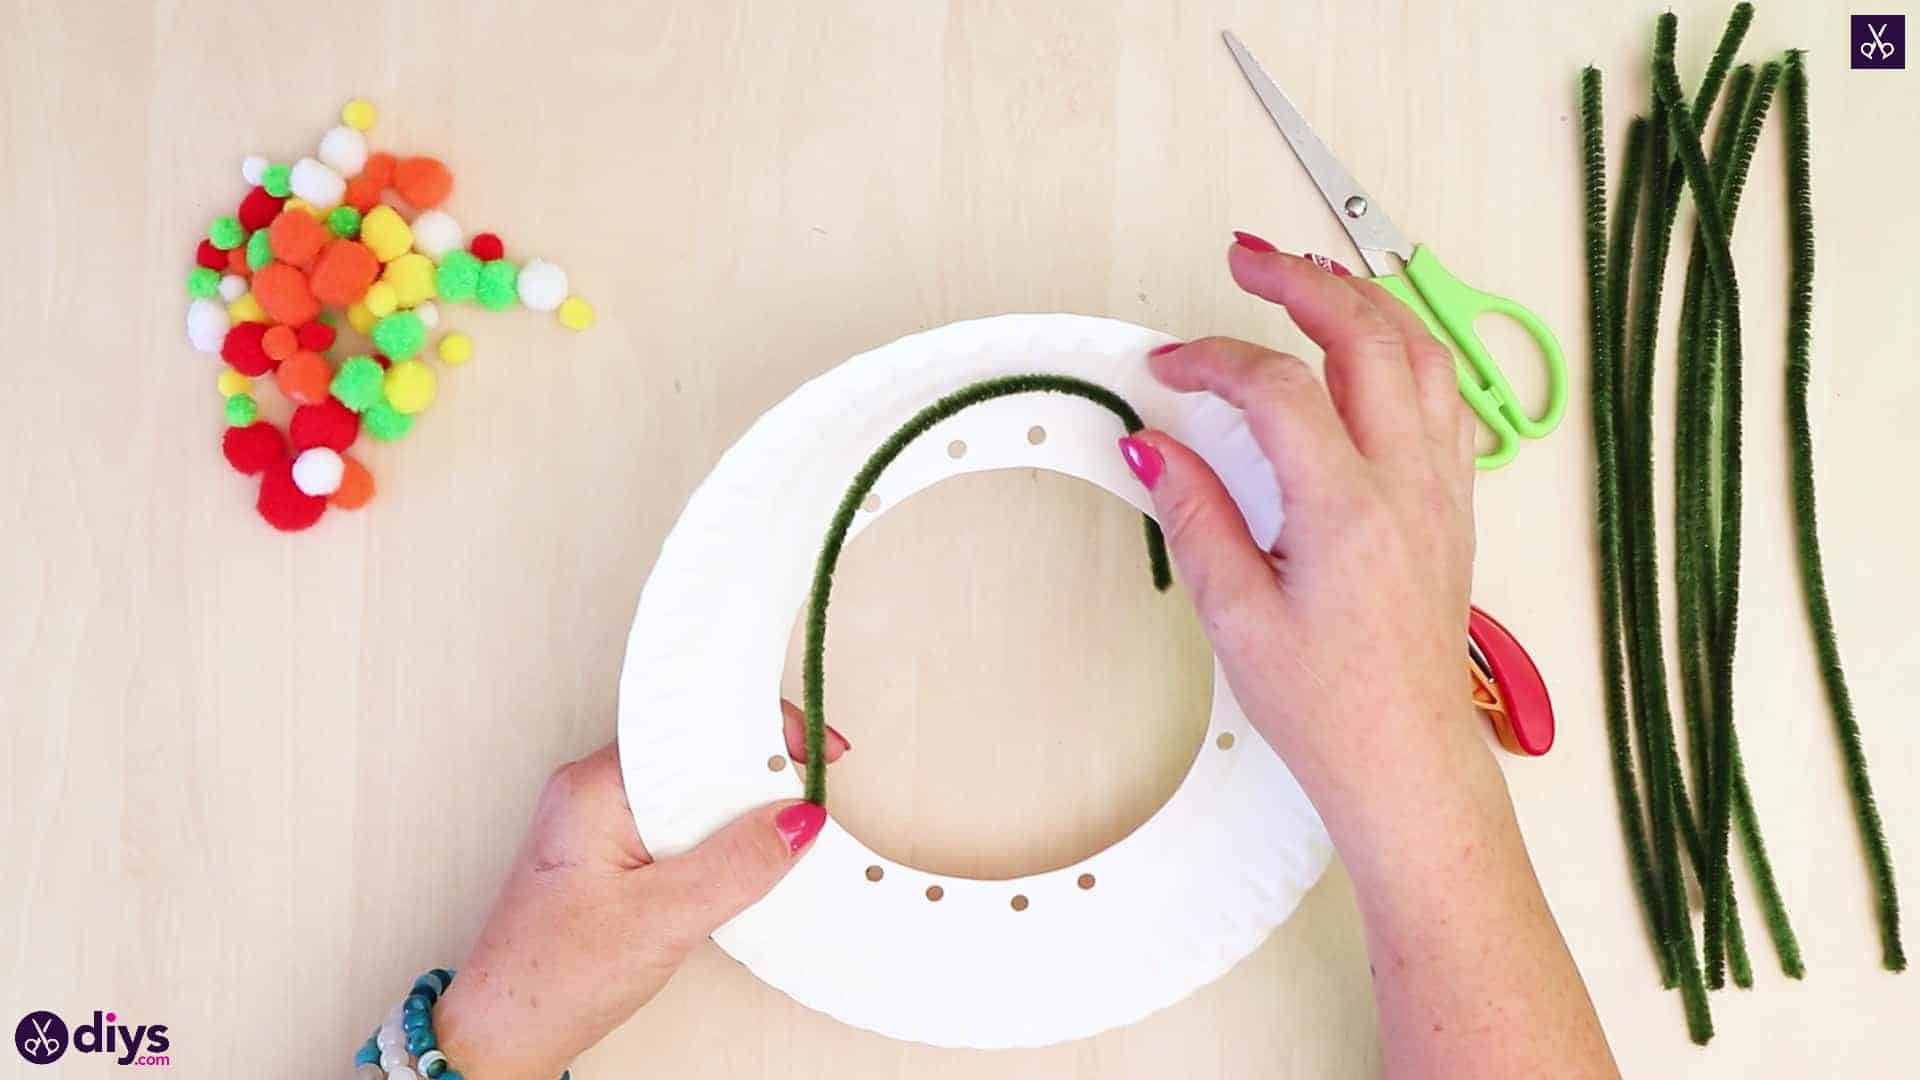 Diy paper plate tree art step 4a